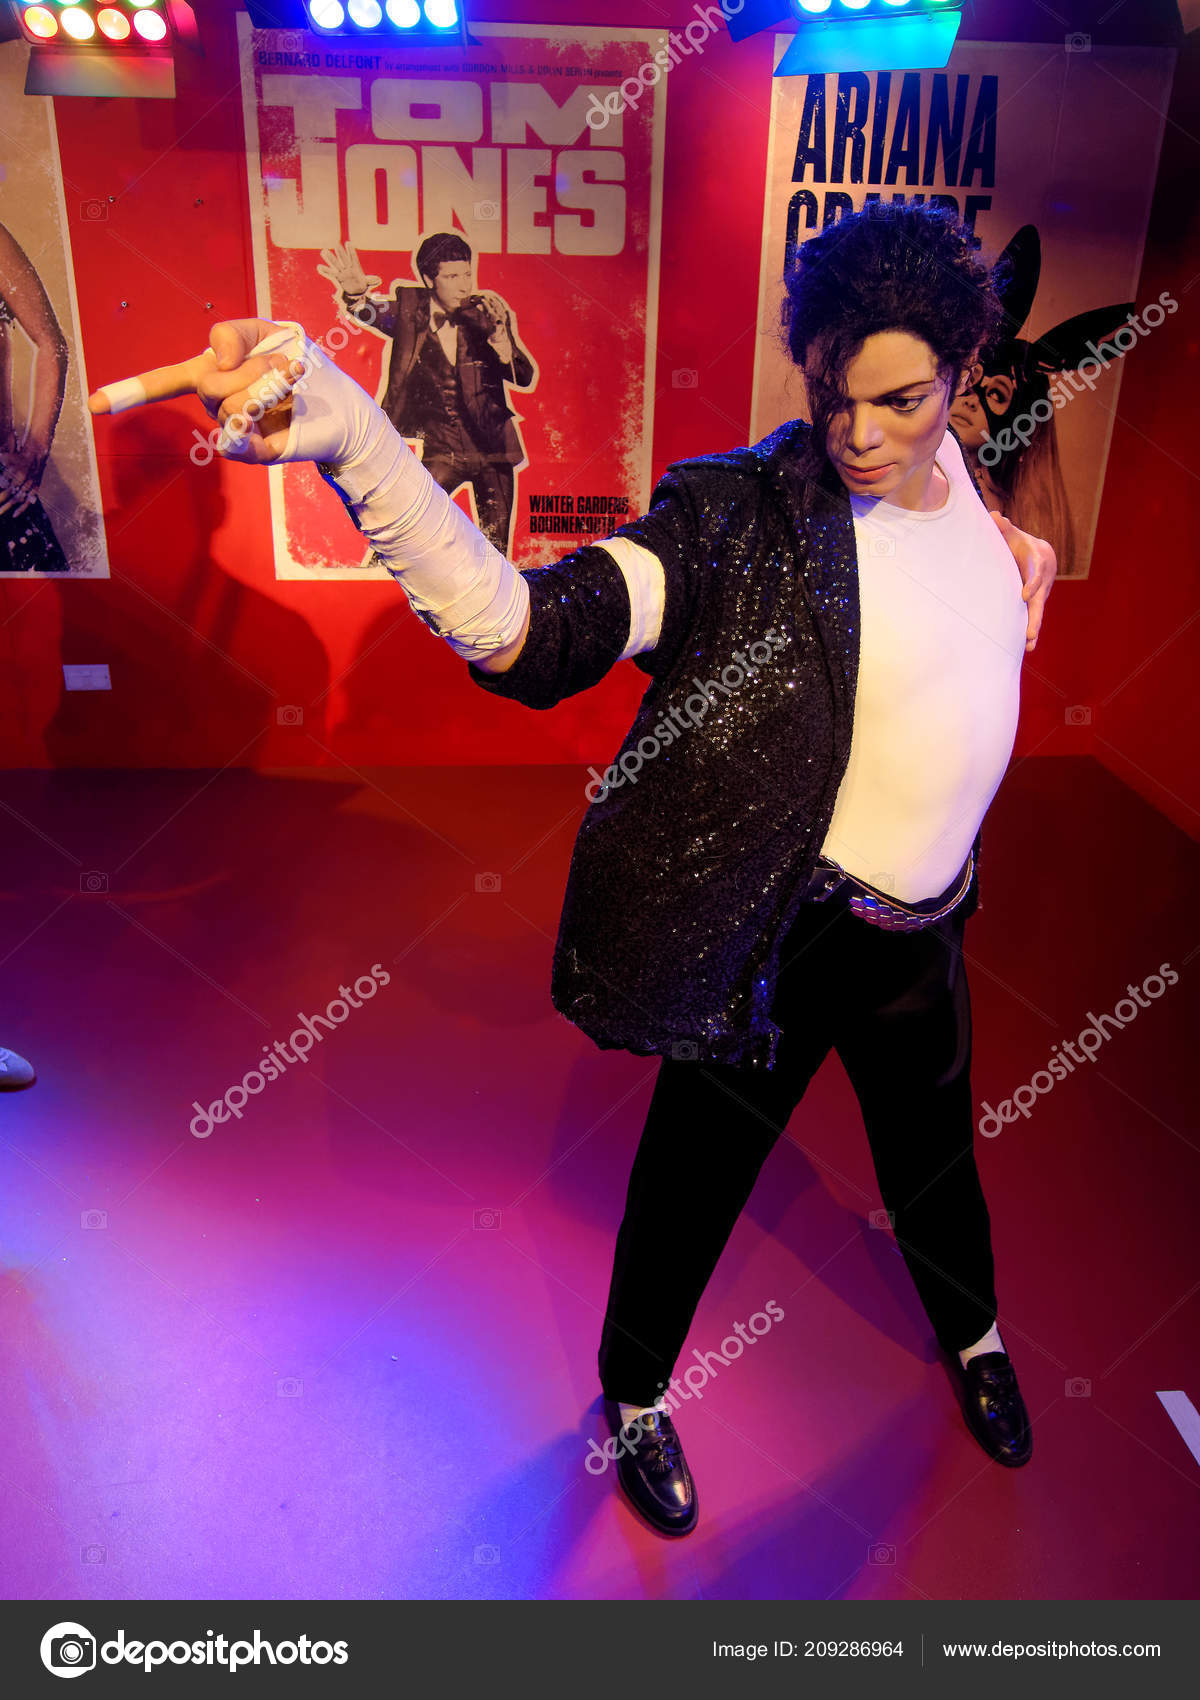 e140723ead5 Αθήνα, 14 Ιανουαρίου: Τζάκσον κερί άγαλμα στο Μουσείο της Madame Tussauds, Ηνωμένο  Βασίλειο 2018 — Εικόνα από ...